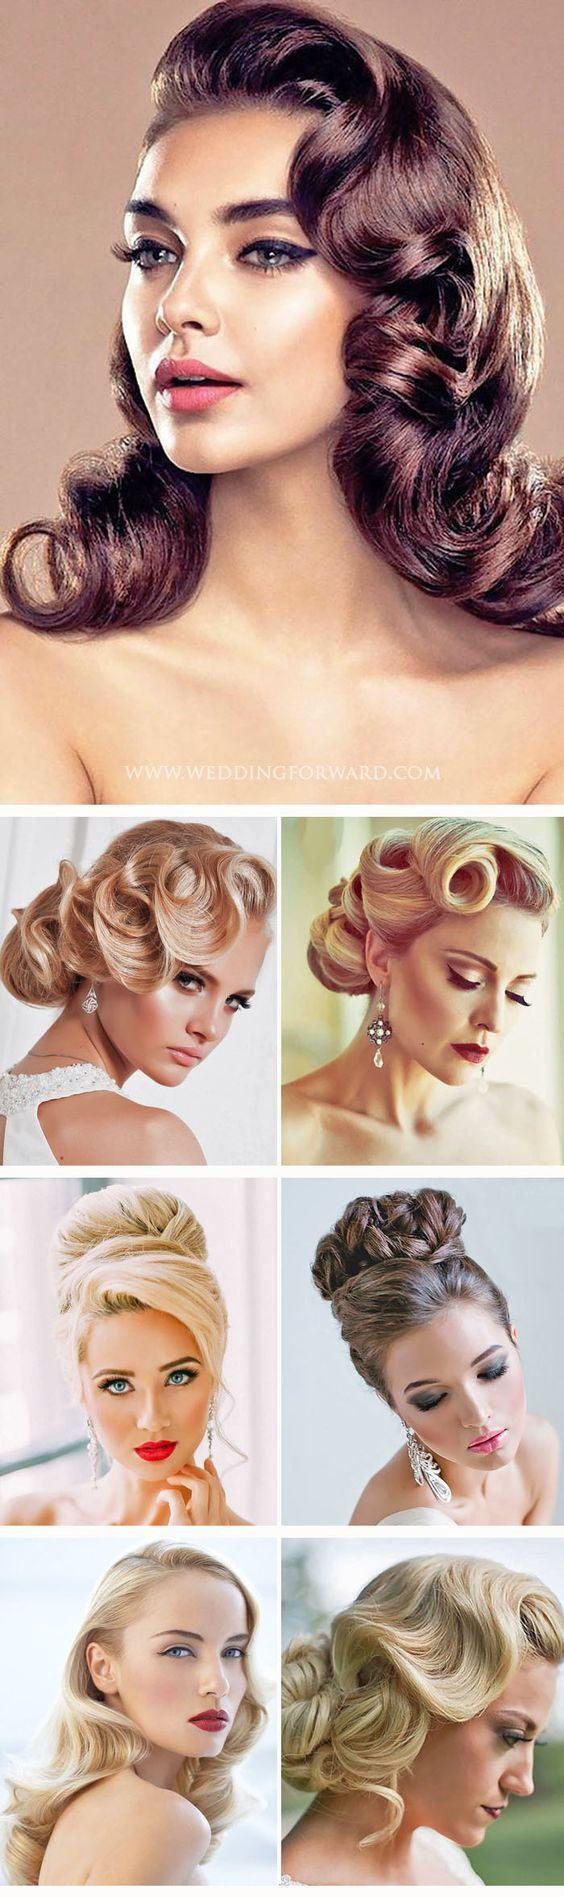 25 Best Ideas About Retro Wedding Hairstyles On Pinterest